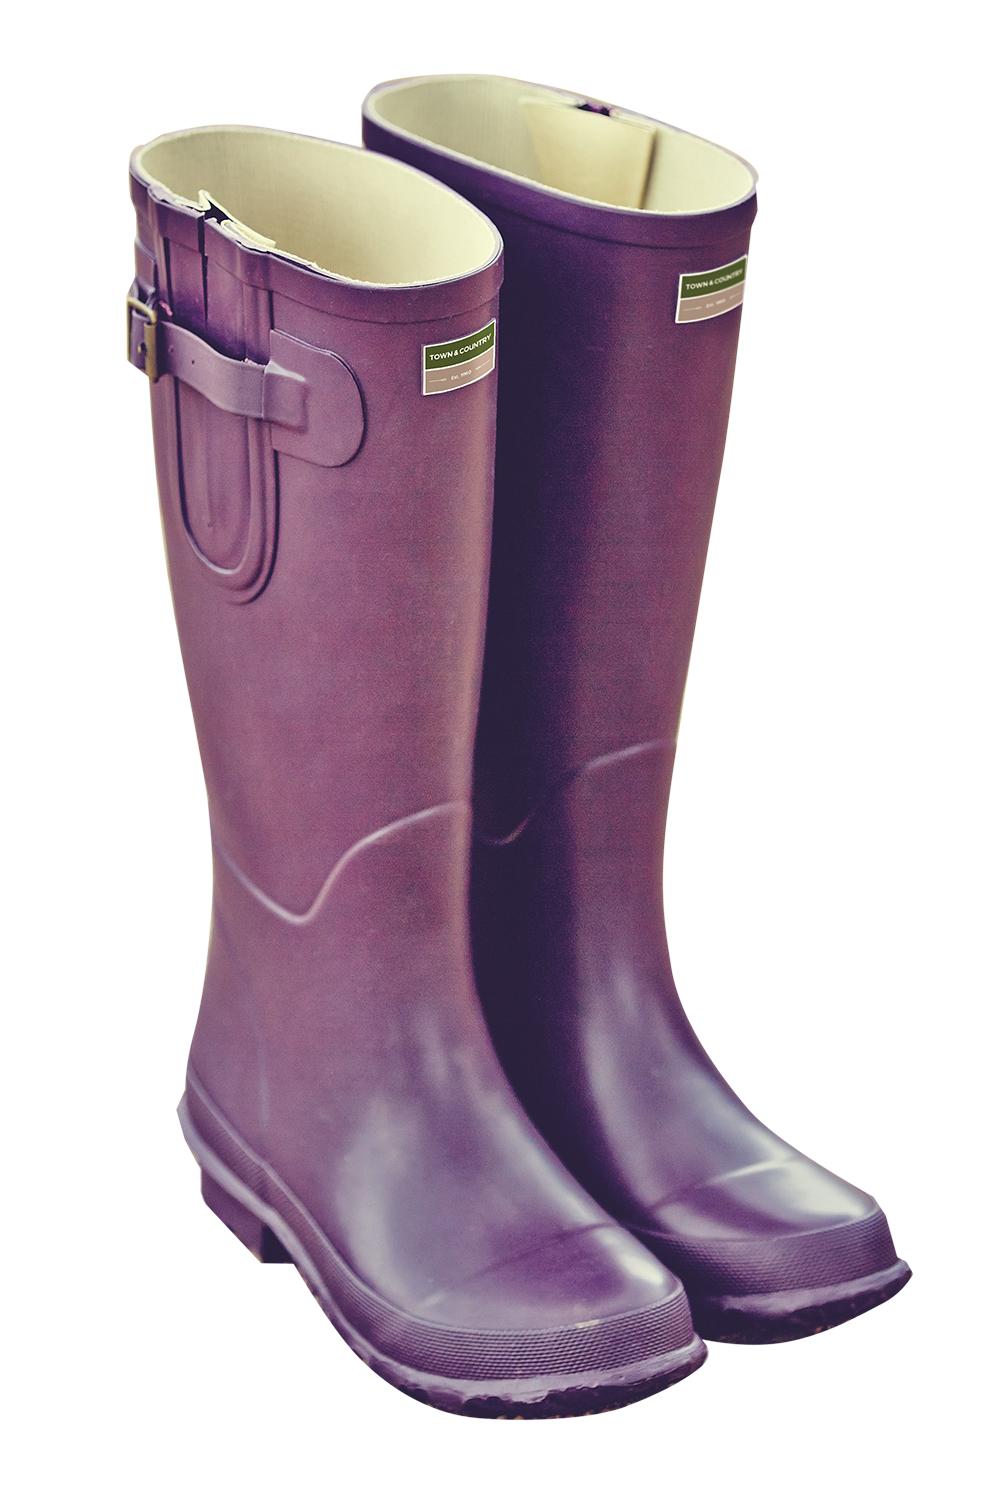 Bosworth Wellington Boots